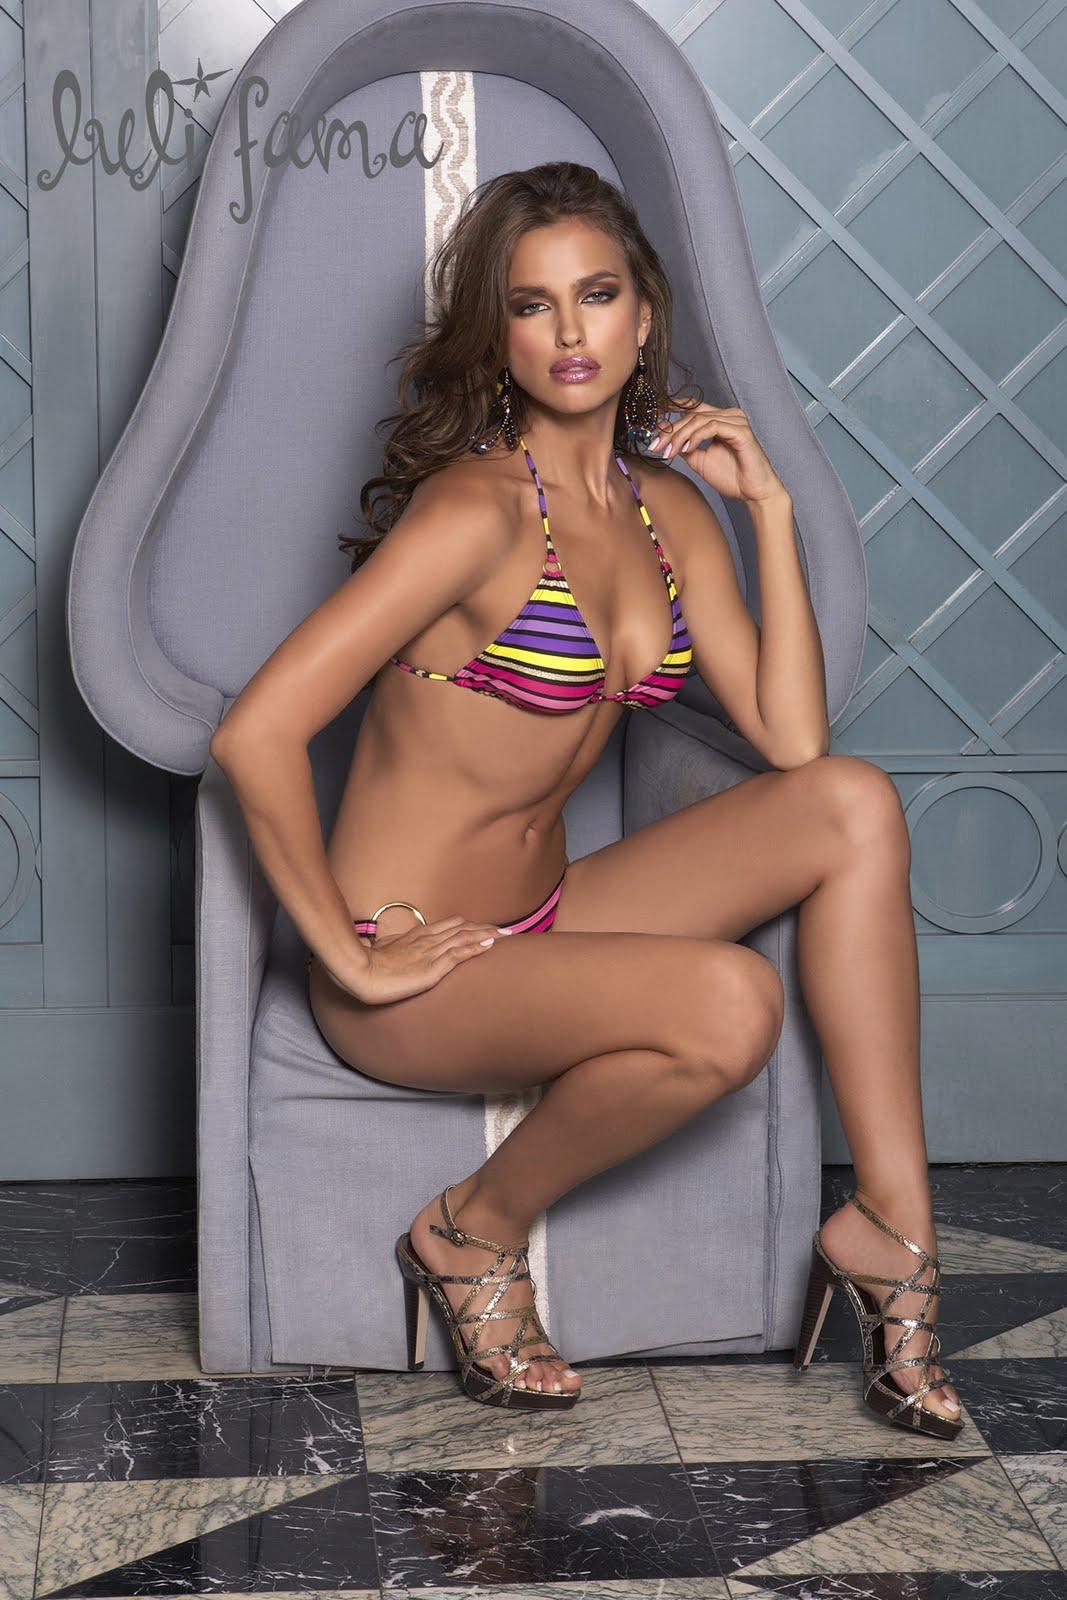 http://3.bp.blogspot.com/-kElTH21sPwQ/TZLCzYOlG5I/AAAAAAAASJs/pUcck965gyk/s1600/Irina-Shayk-Bikini-Wallpapers-2011.jpg